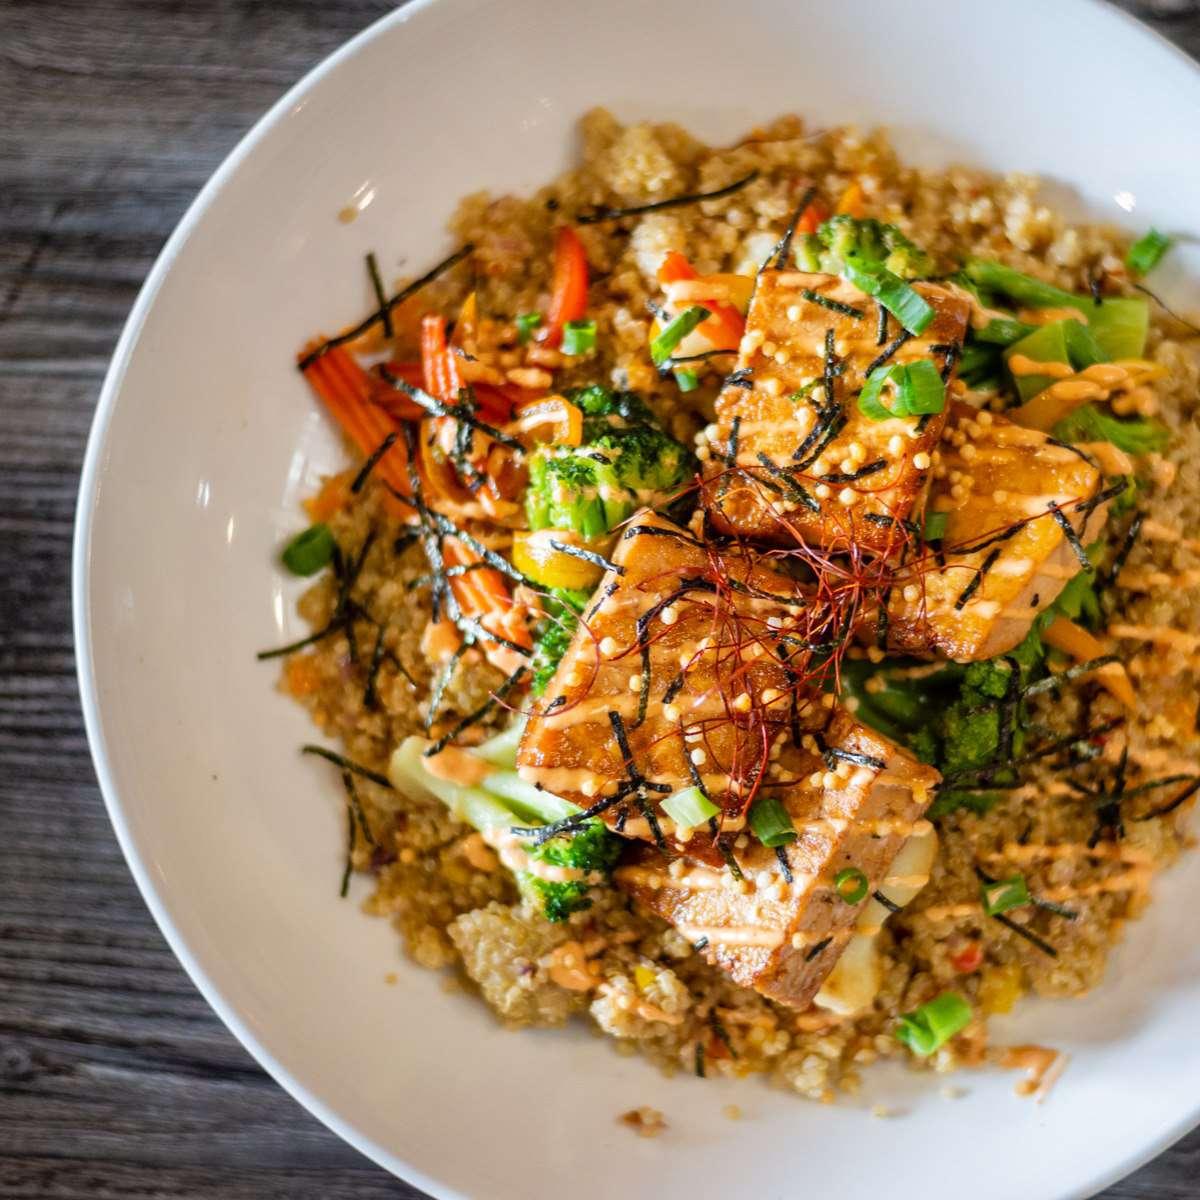 Quinoa with broccoli, tofu, carrots, sesame seeds and nori flakes